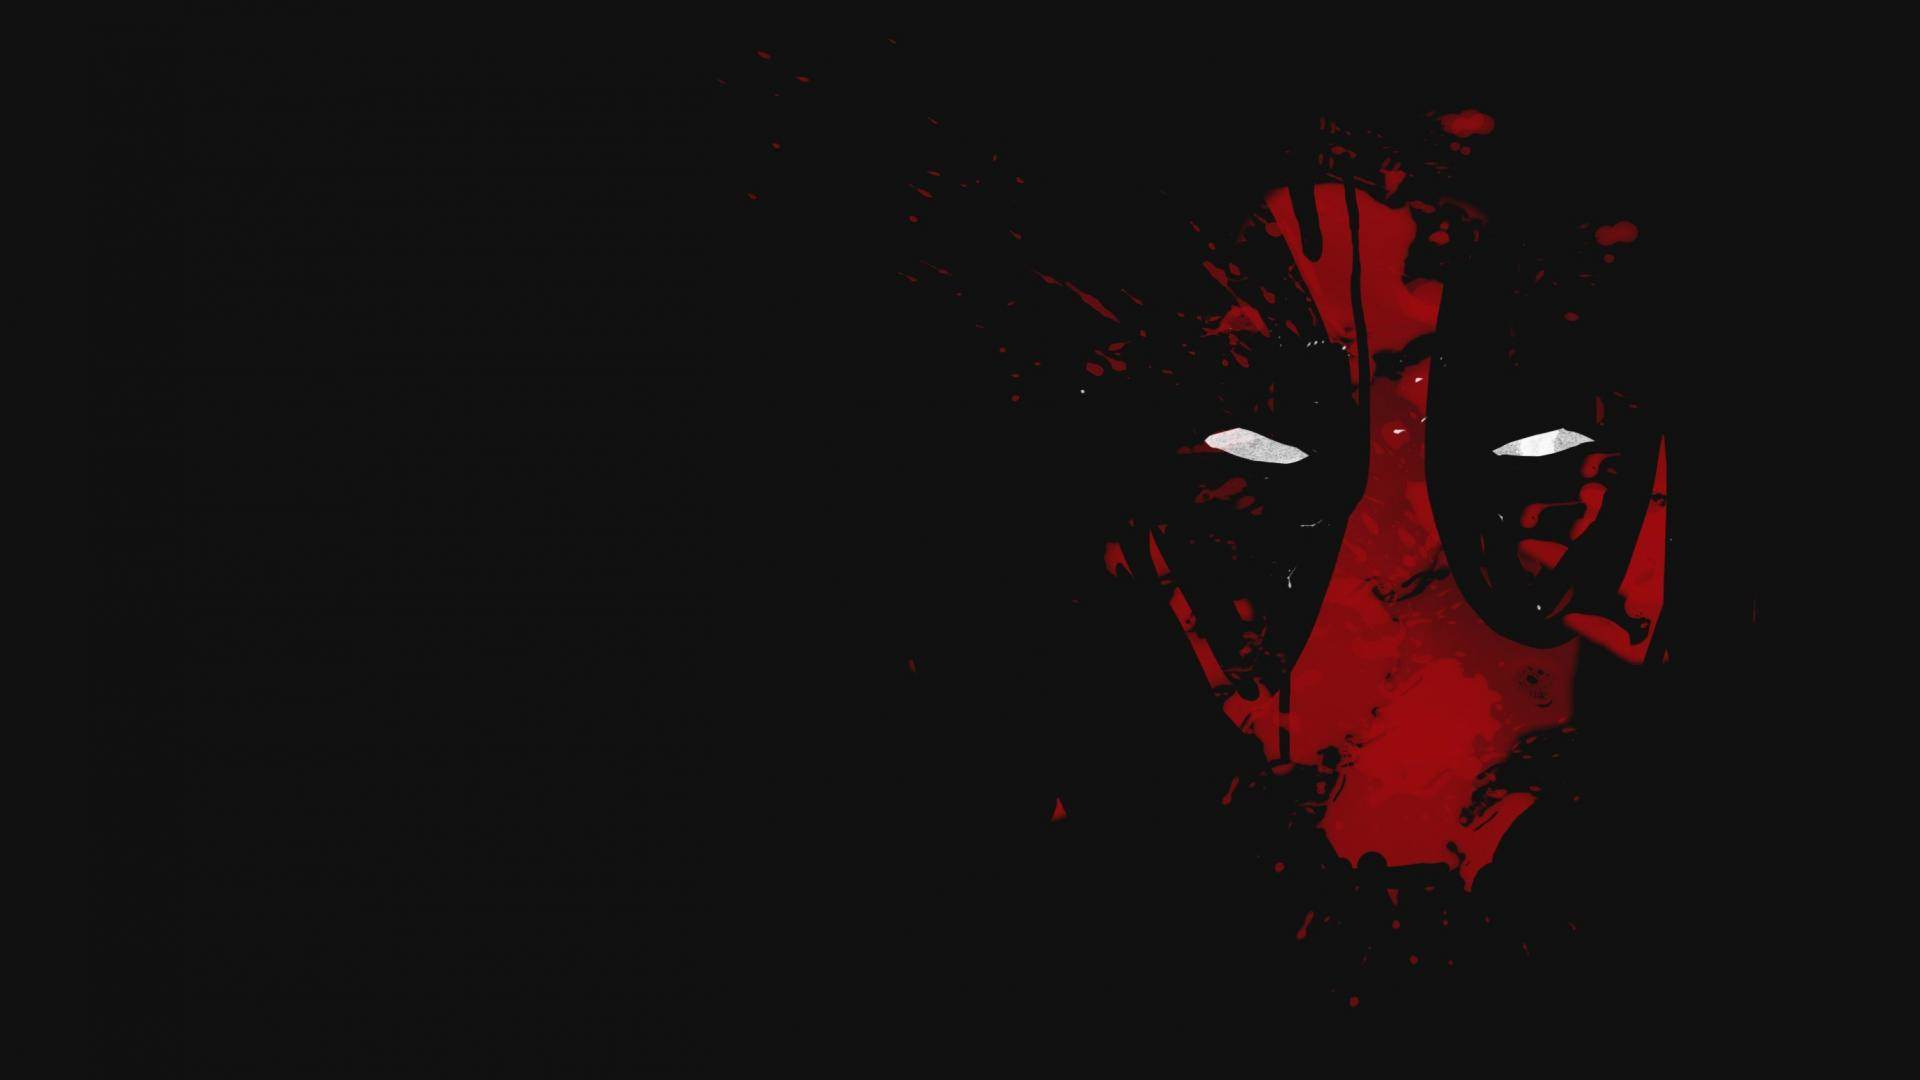 Deadpool Mac Wallpapers Top Free Deadpool Mac Backgrounds